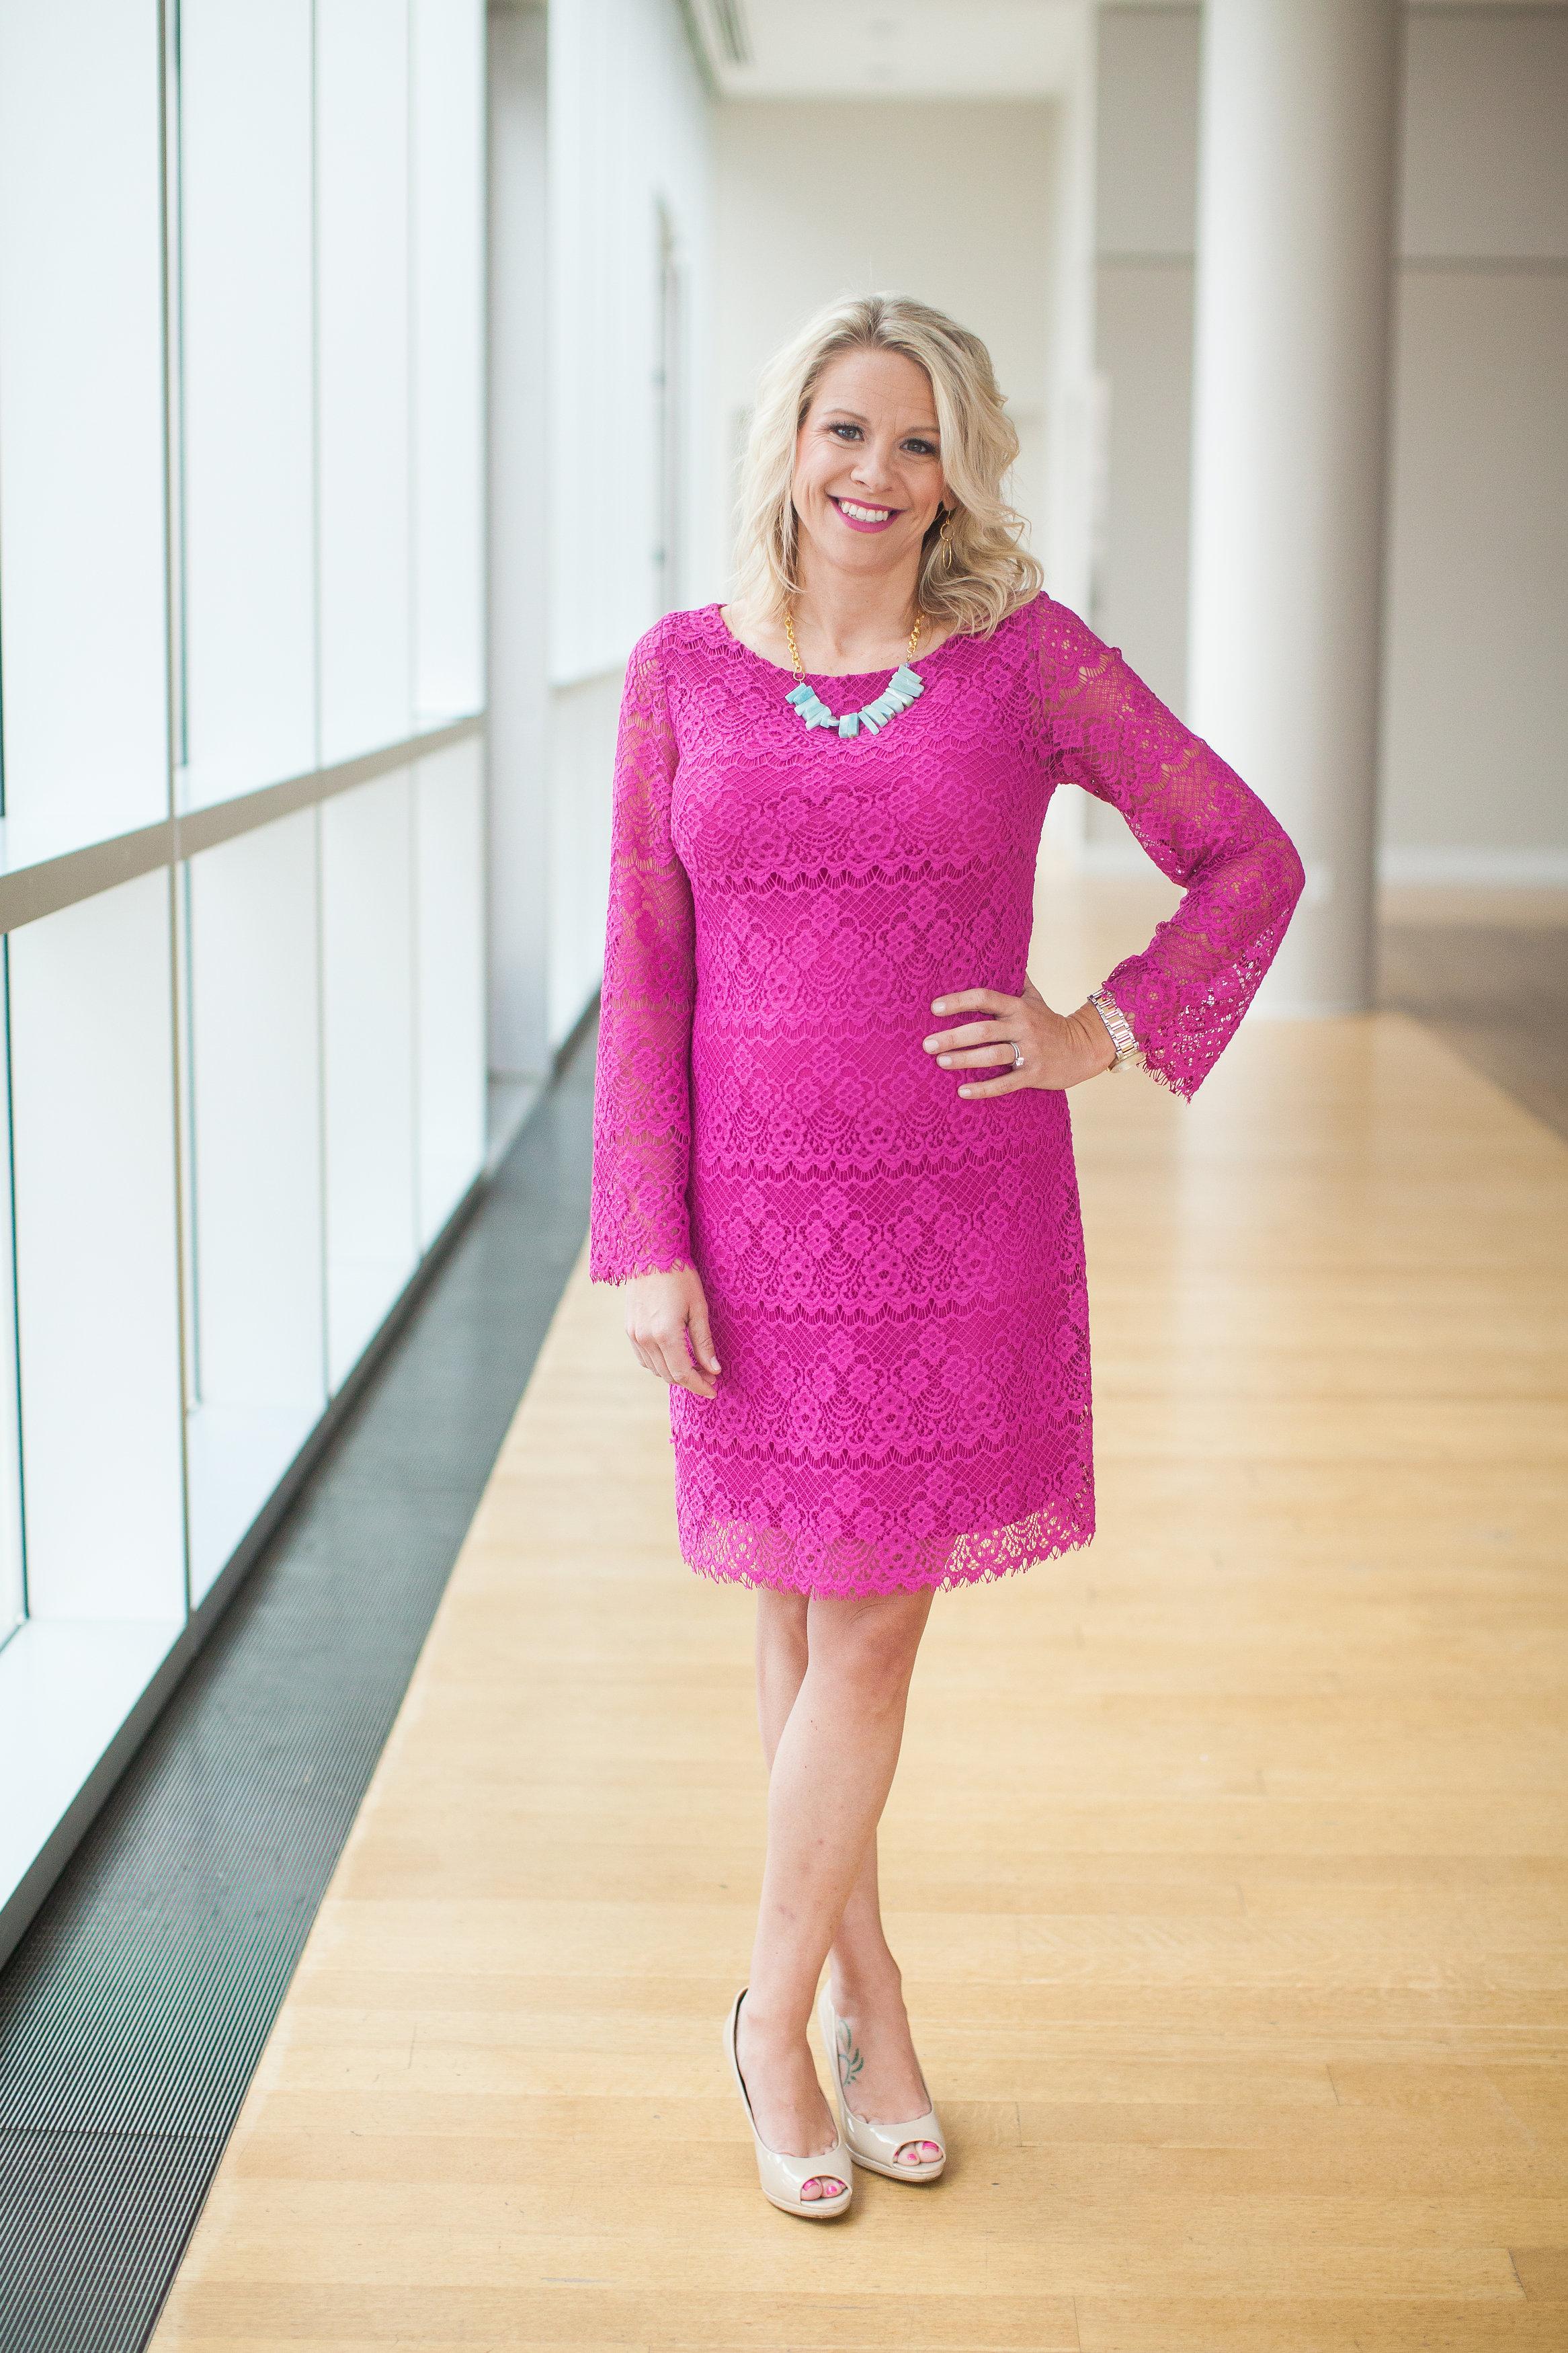 Charlotte Wedding Designer | Luxury Bridal Consultant | Erica Stawick Events